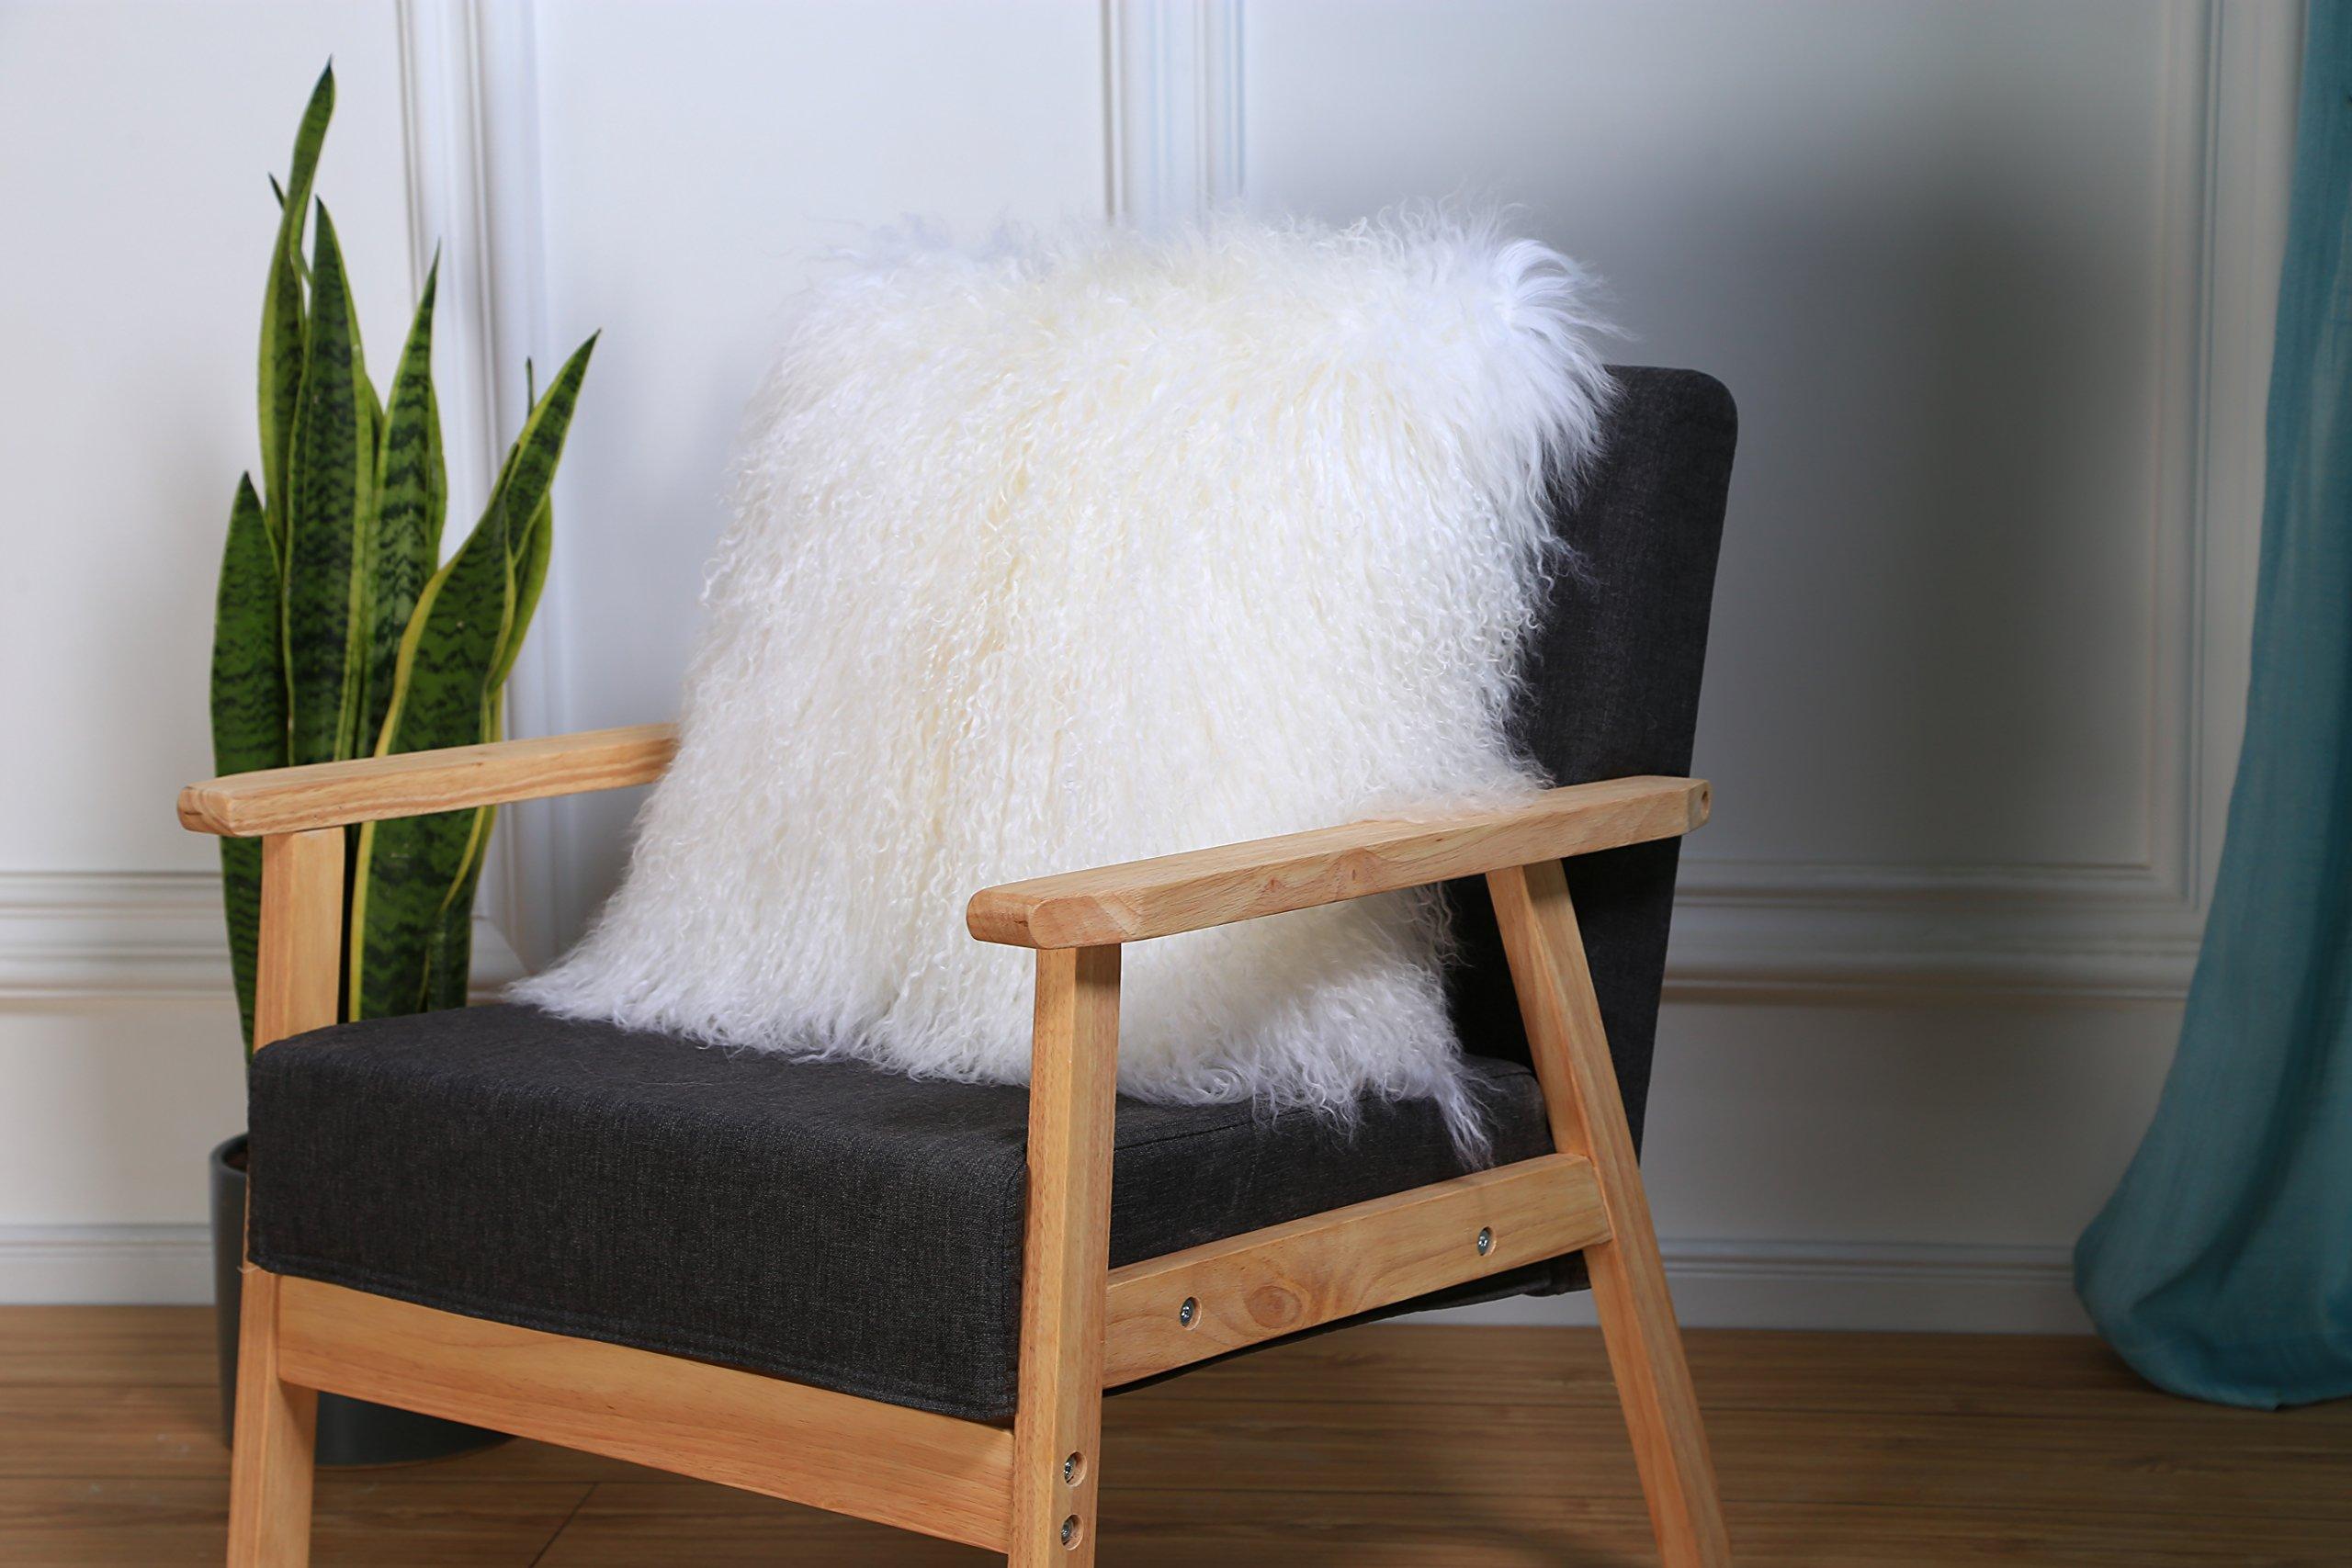 February Snow Deluxe Home Decorative Rectangular Soft Plush 100% Real Mongolian (Tibetan) Lamb Wool Pillow/cushion Cover/Case (White, 20x20inch)